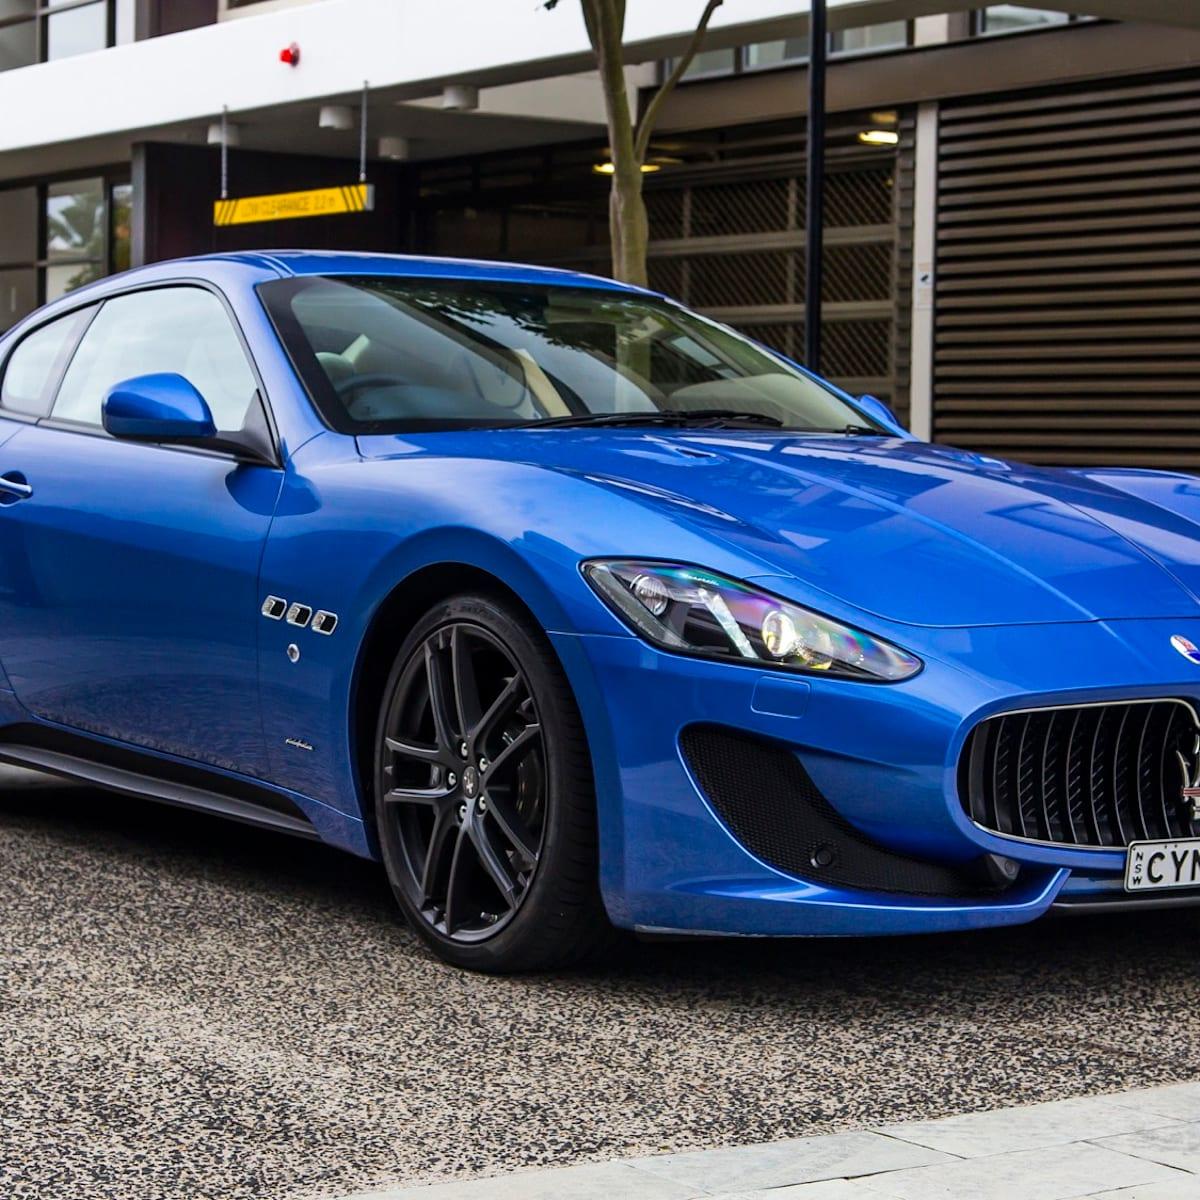 2015 Maserati Granturismo Mc Sportline Review Caradvice